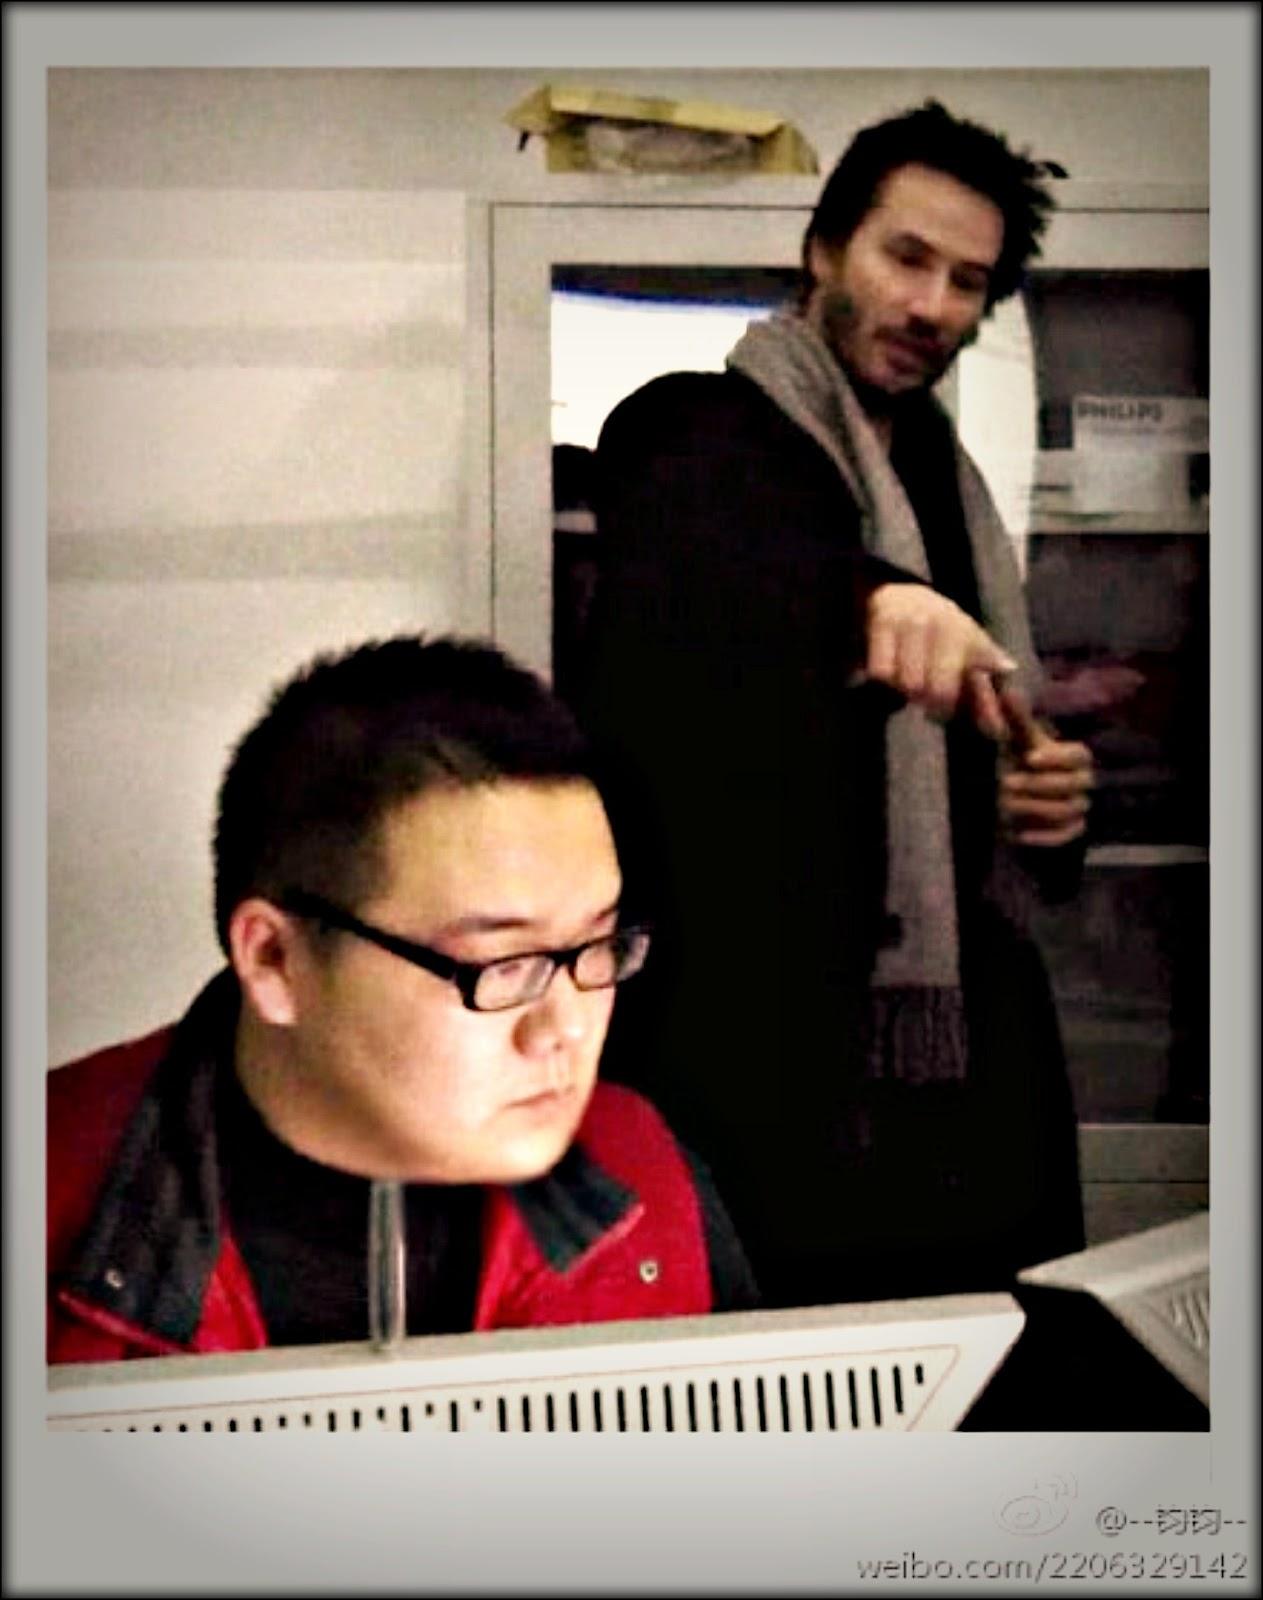 http://1.bp.blogspot.com/-Y_Qoa7oLBgY/Tr7JCjlUh8I/AAAAAAAAAaM/8Rbp5b39lp4/s1600/keanu+12-11-2011+Beijing+8381e936tw1dmyw1qng8dj%2528PRM%2529.jpg